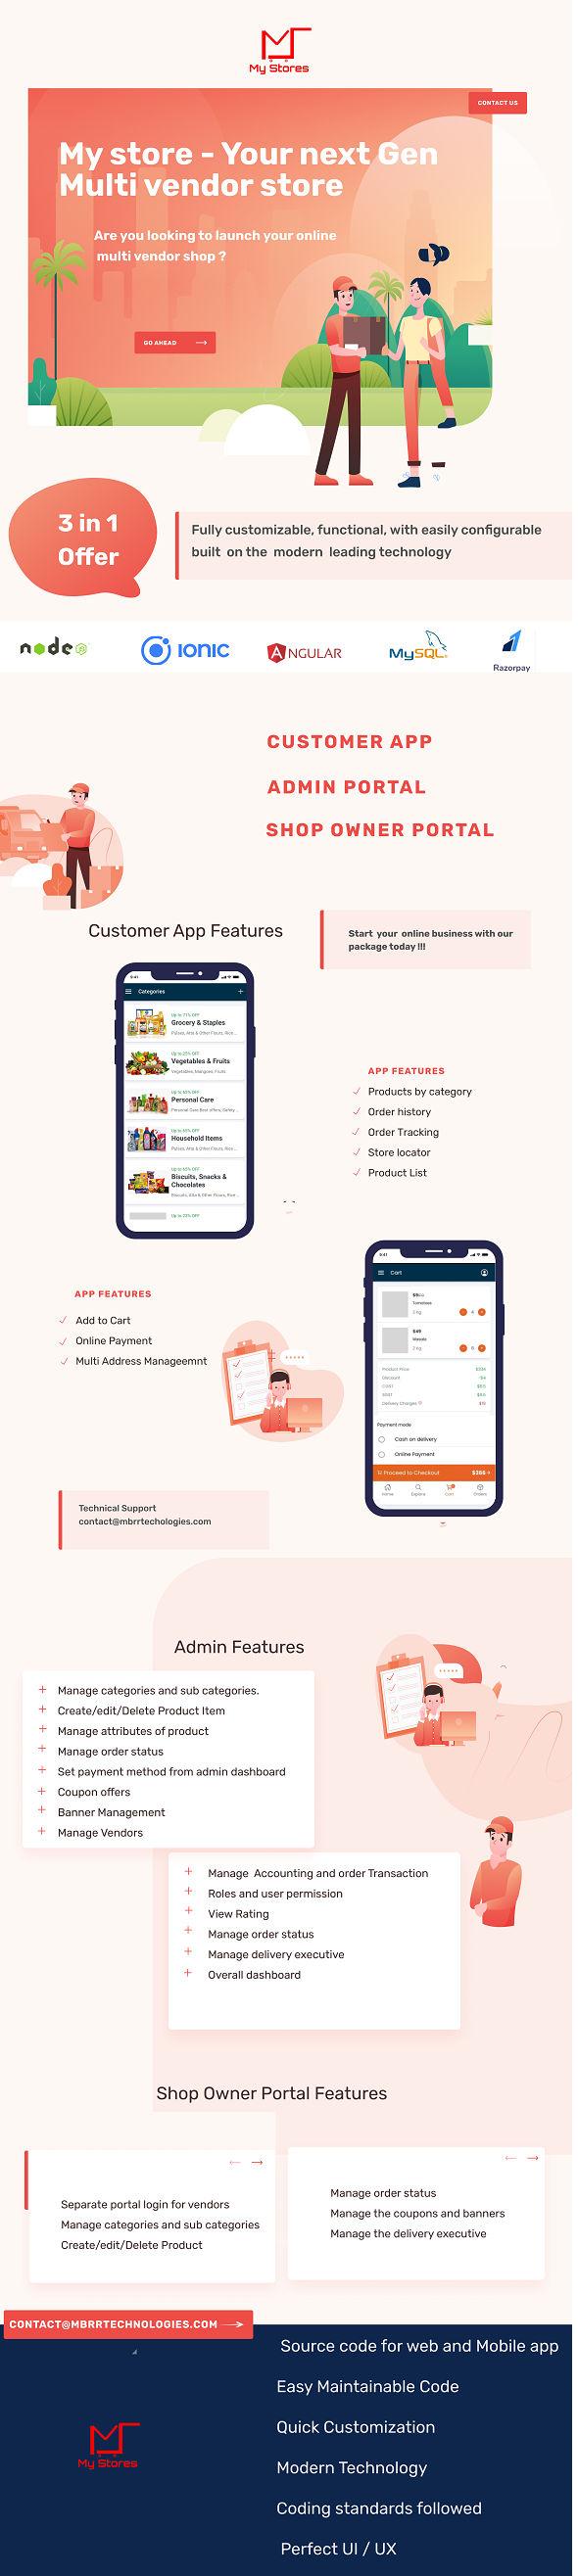 Mystore - Next Gen Multi vendor store - 1